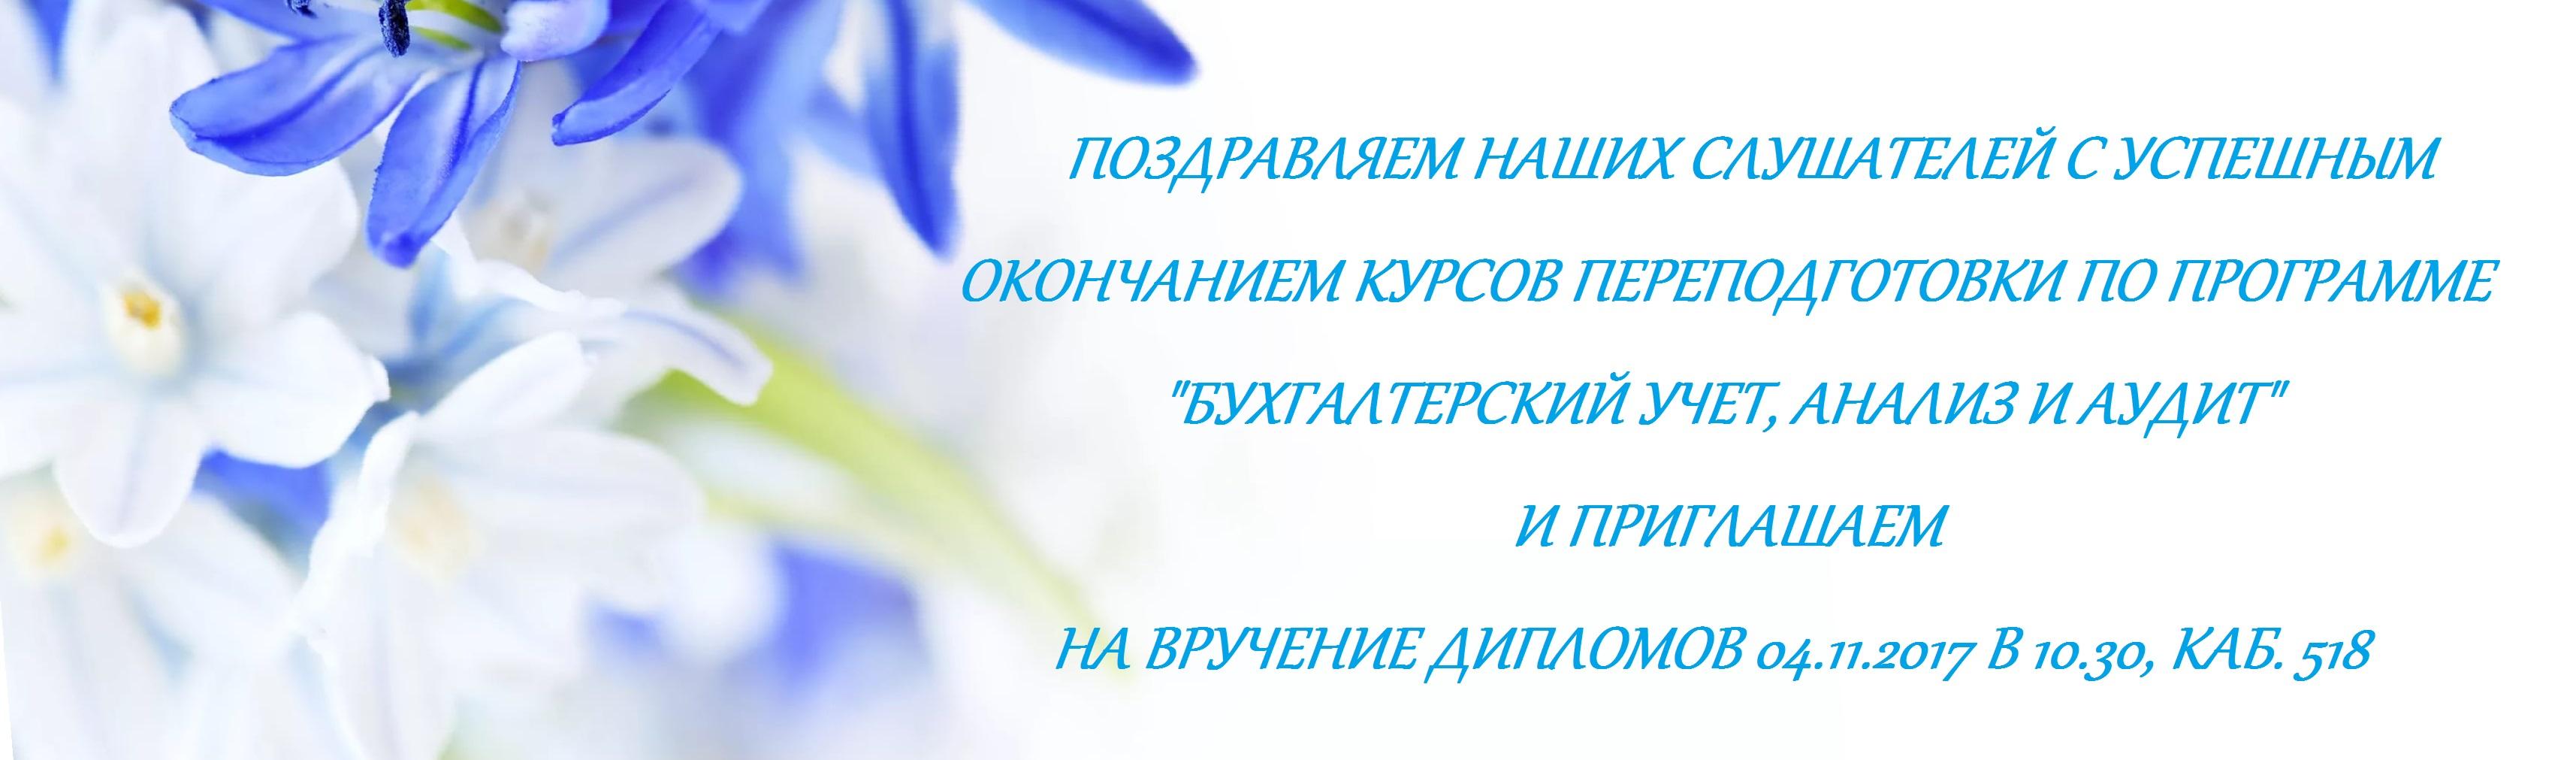 Пригл. 04.11.17